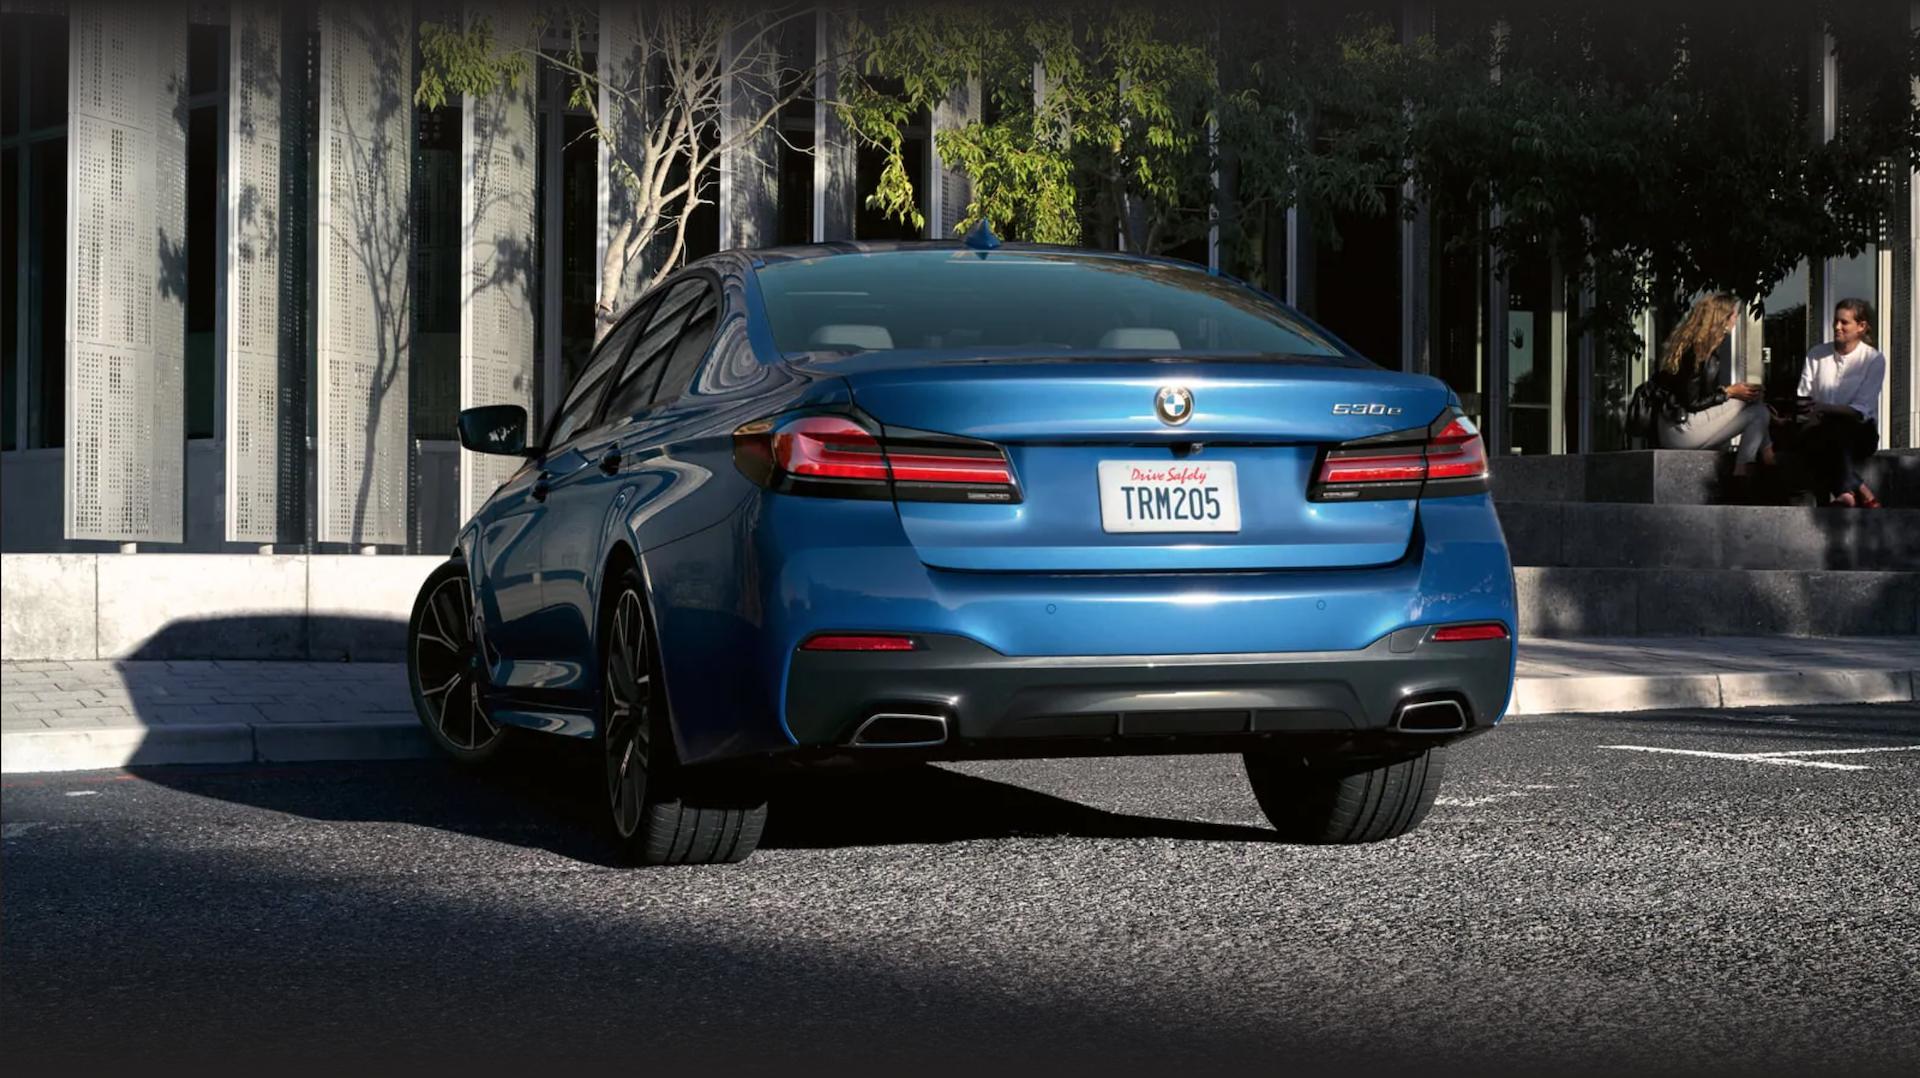 Rear view of the 2021 BMW 5 series luxury sedan